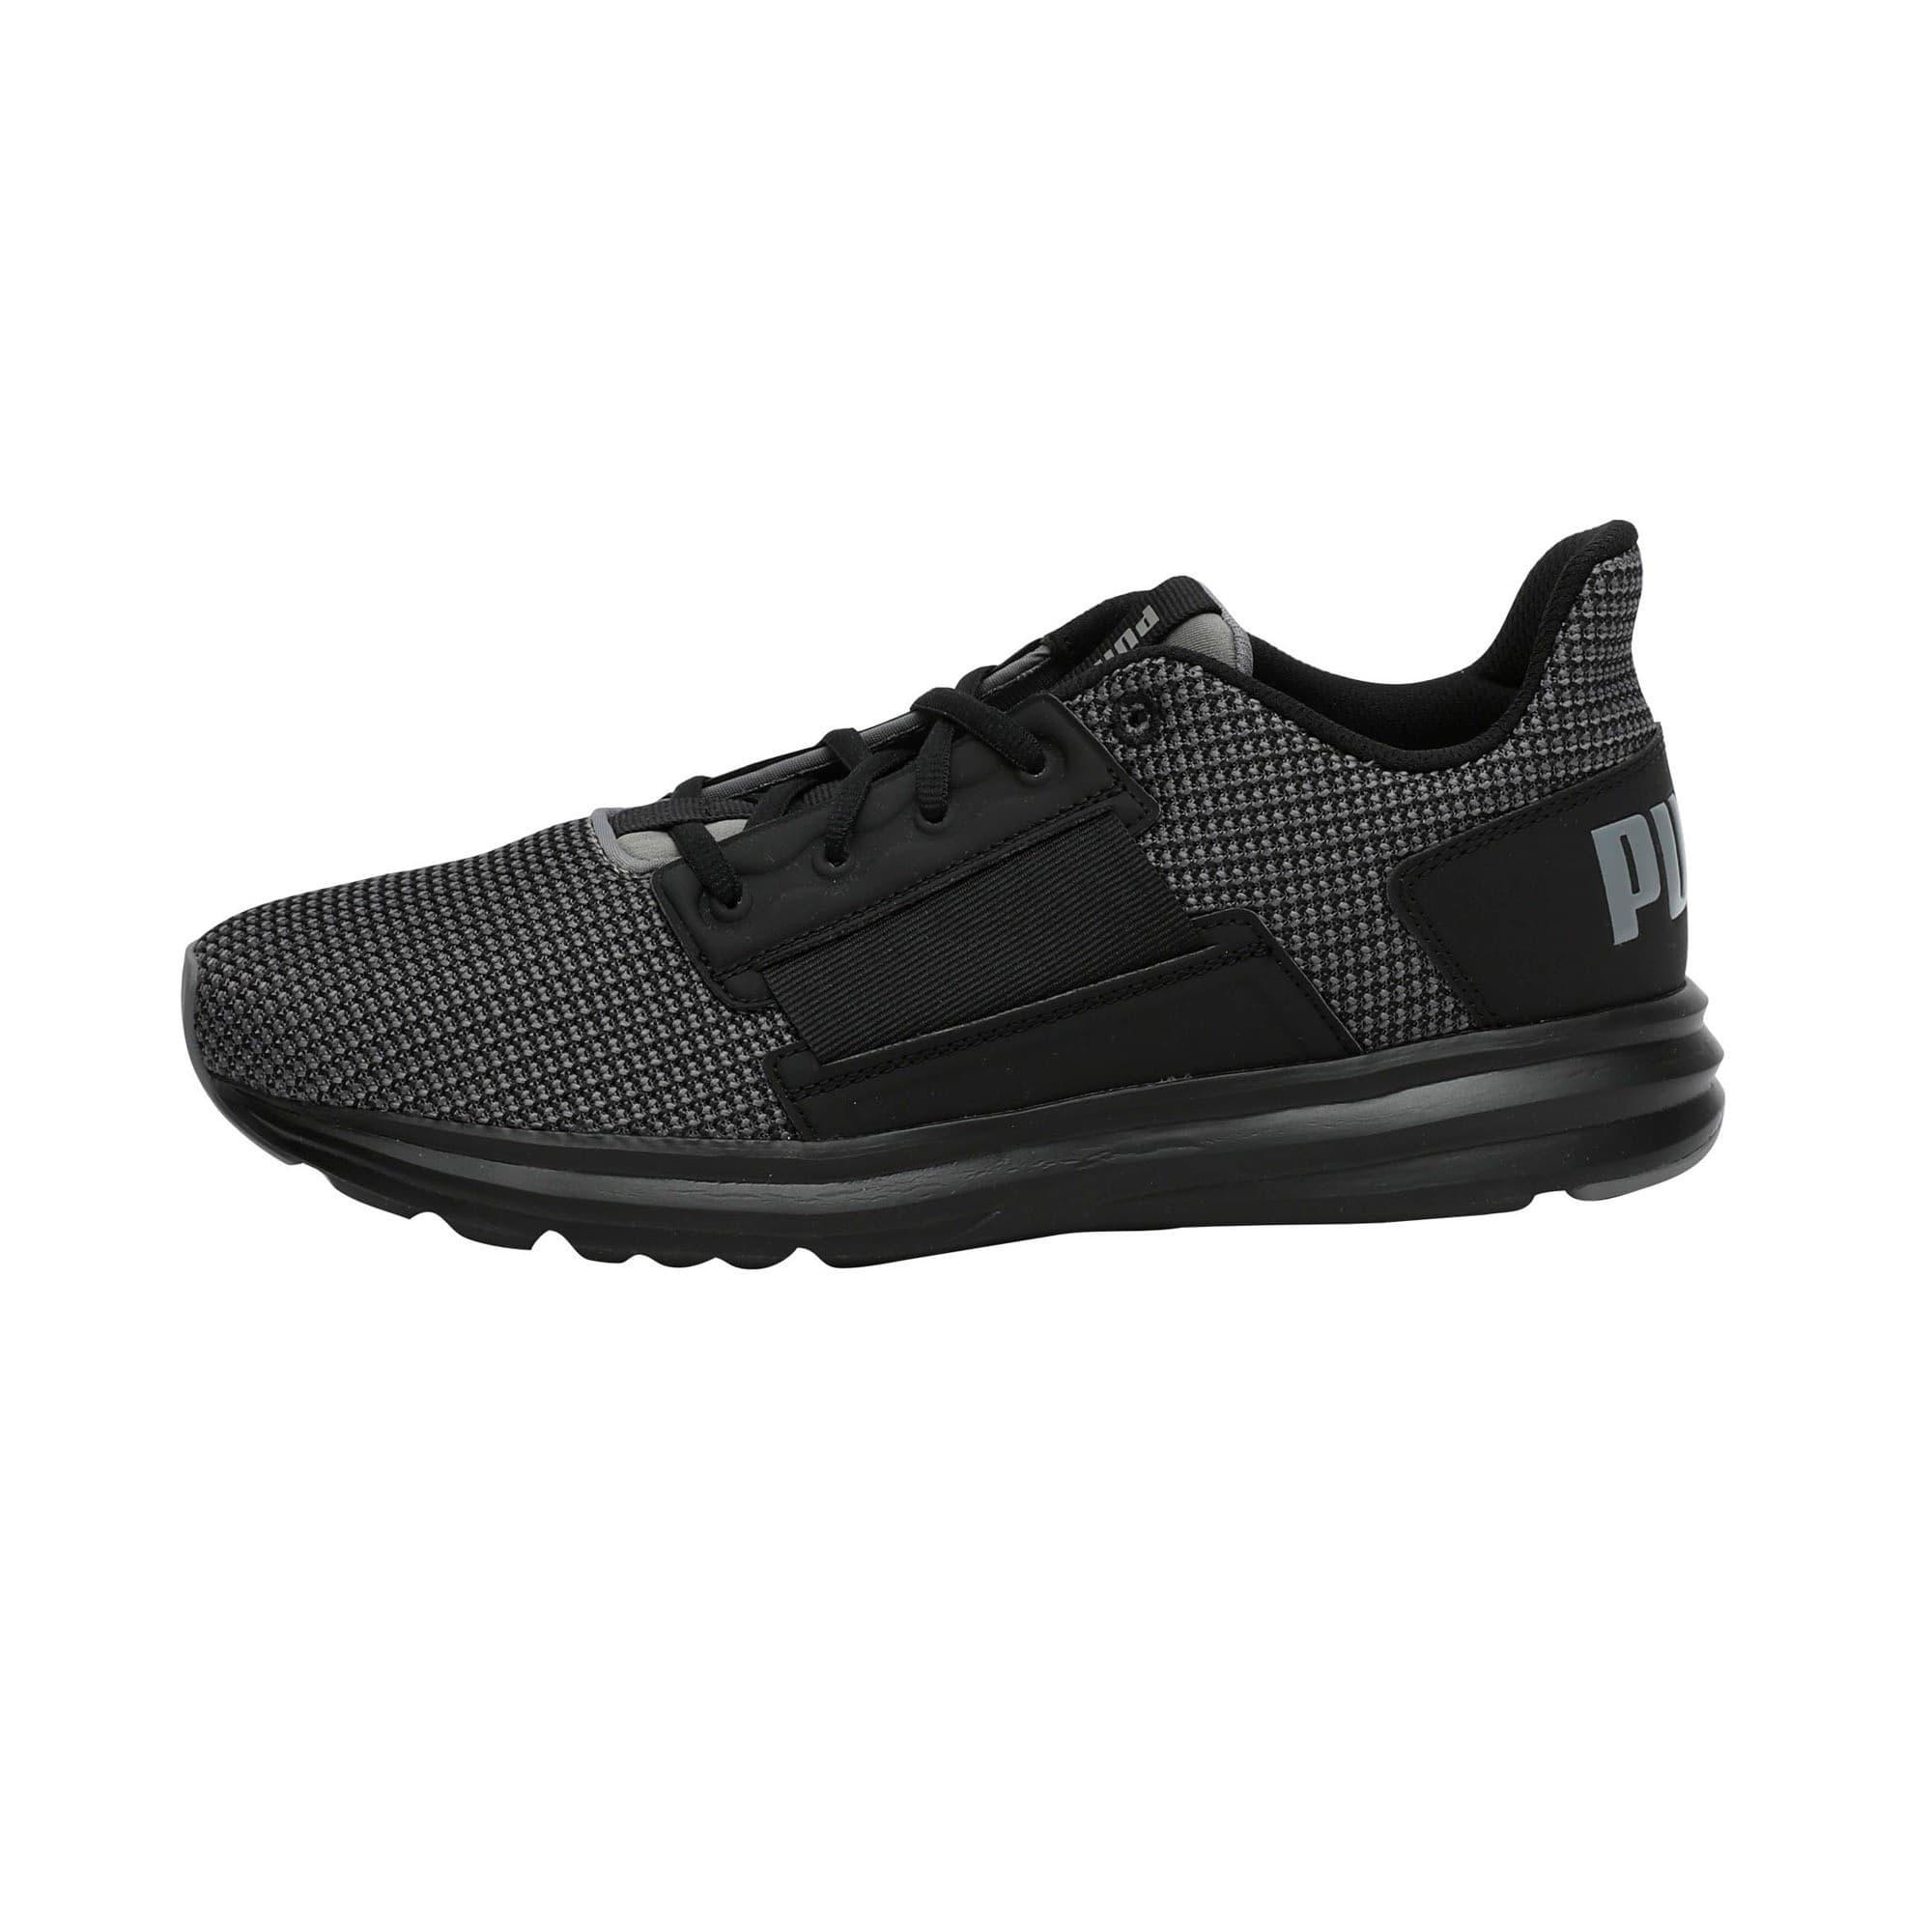 Thumbnail 1 of Enzo Street Knit Men's Running Shoes, QUIET SHADE-Puma Black, medium-IND